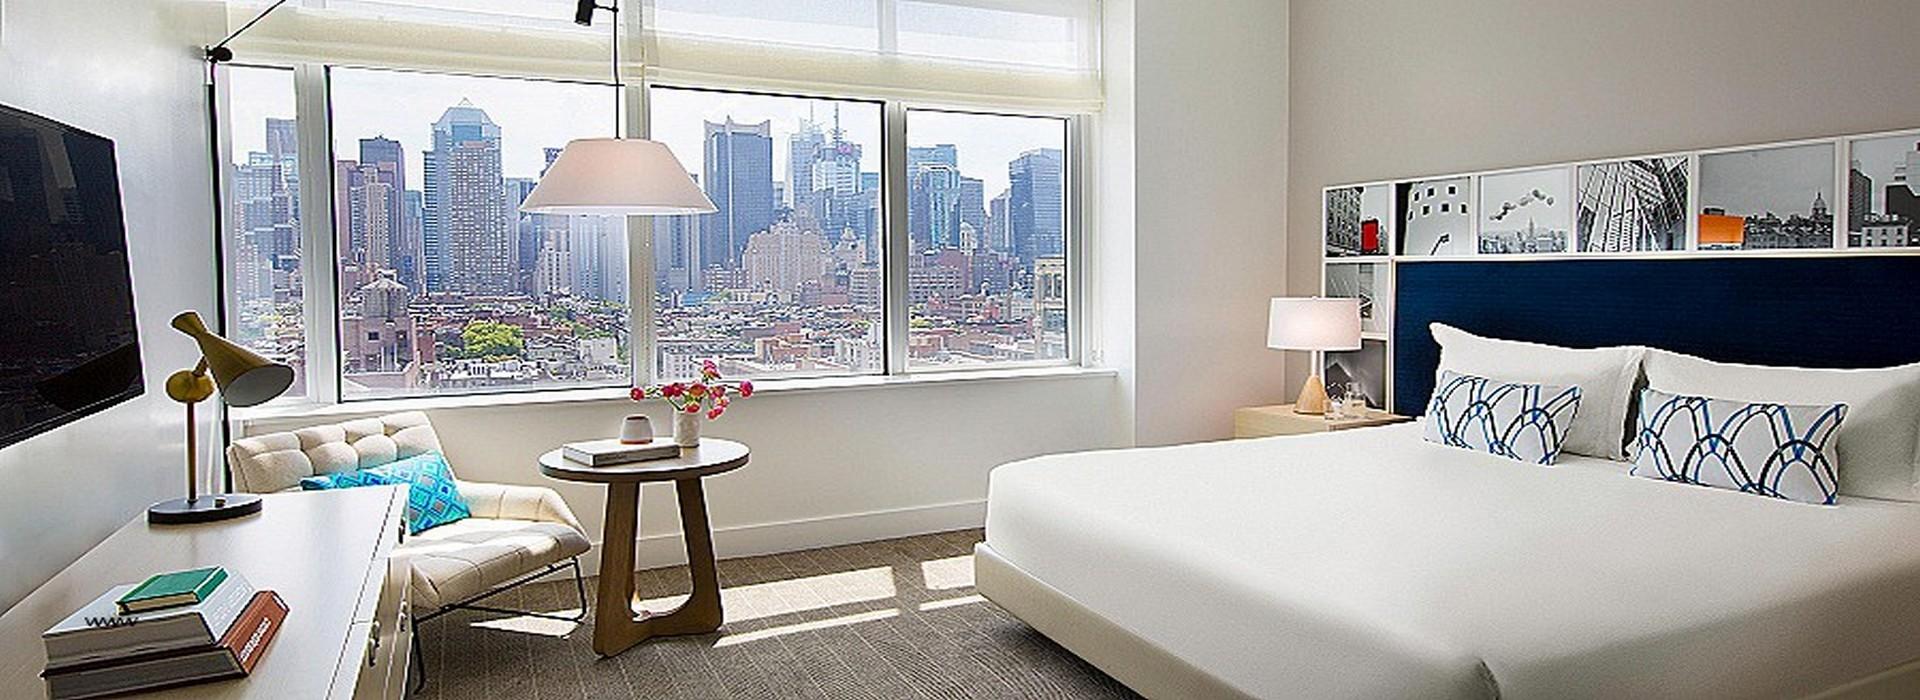 produits et linge jetables usage unique modes lignes. Black Bedroom Furniture Sets. Home Design Ideas